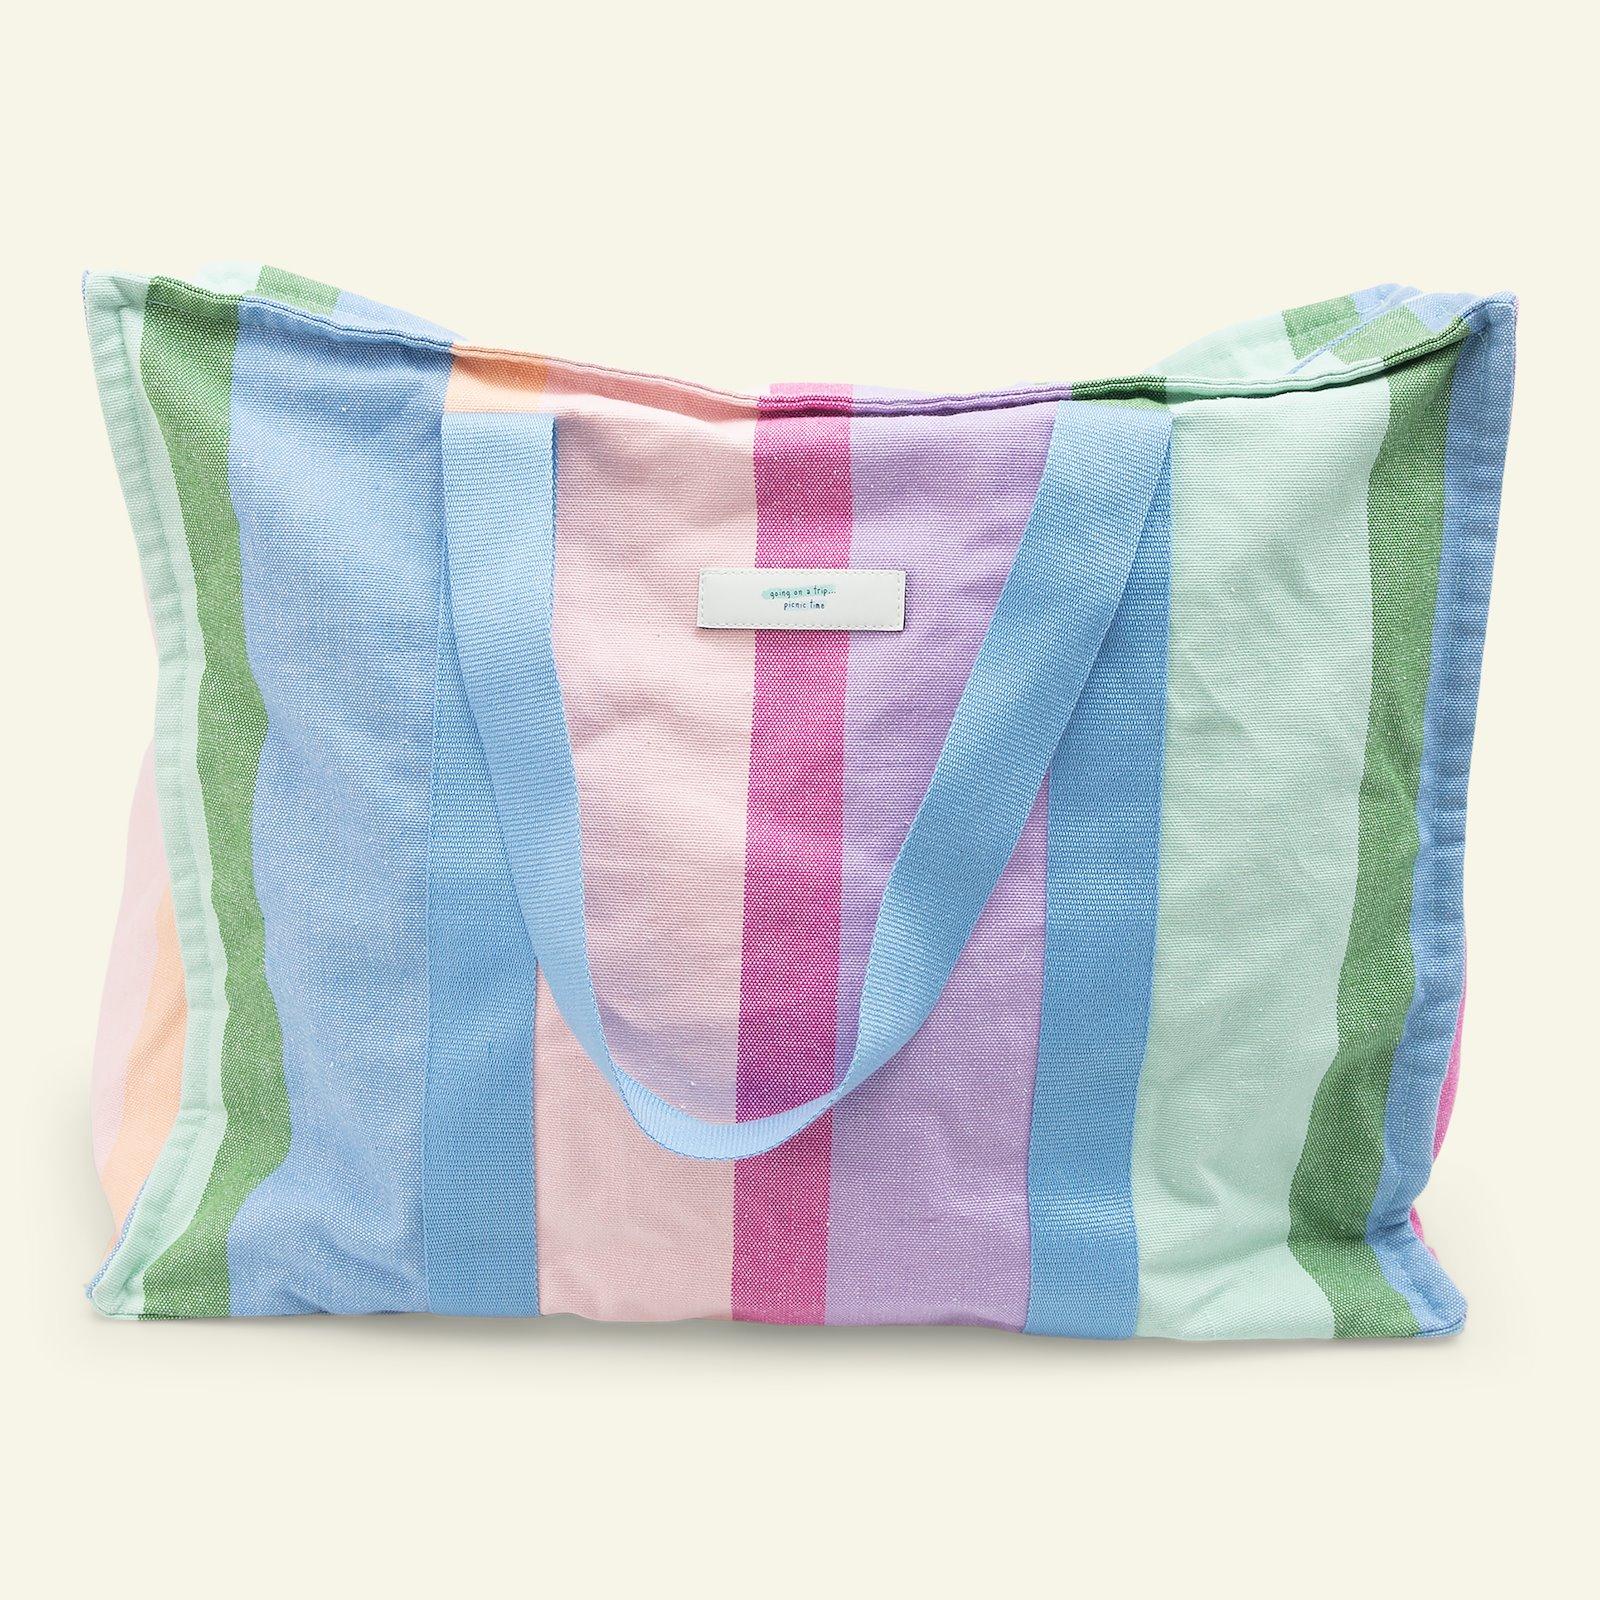 Picnic bag p90337_780494_82312_sskit